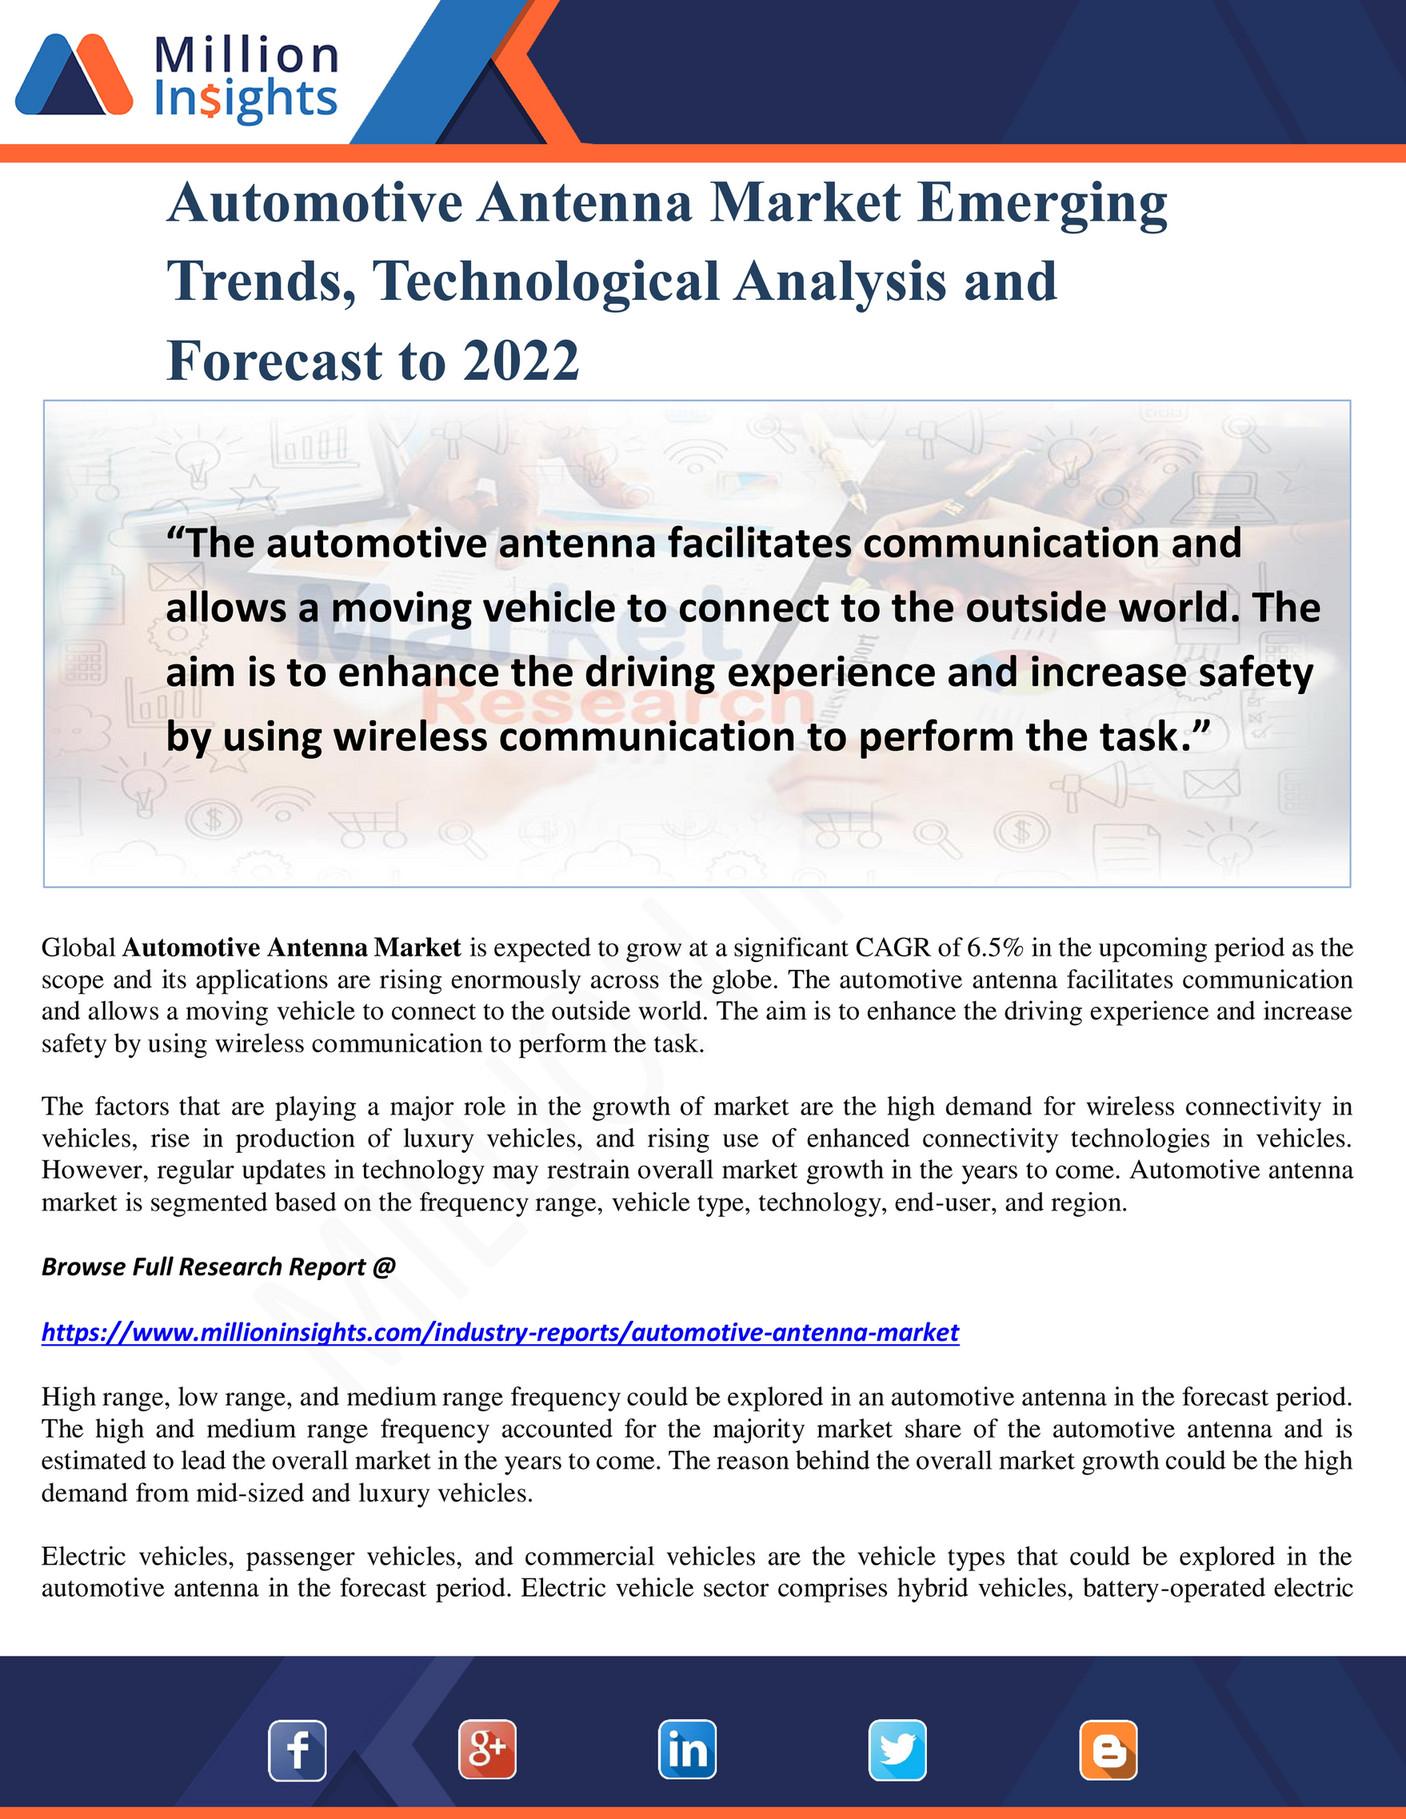 Million Insights - Automotive Antenna Market Emerging Trends